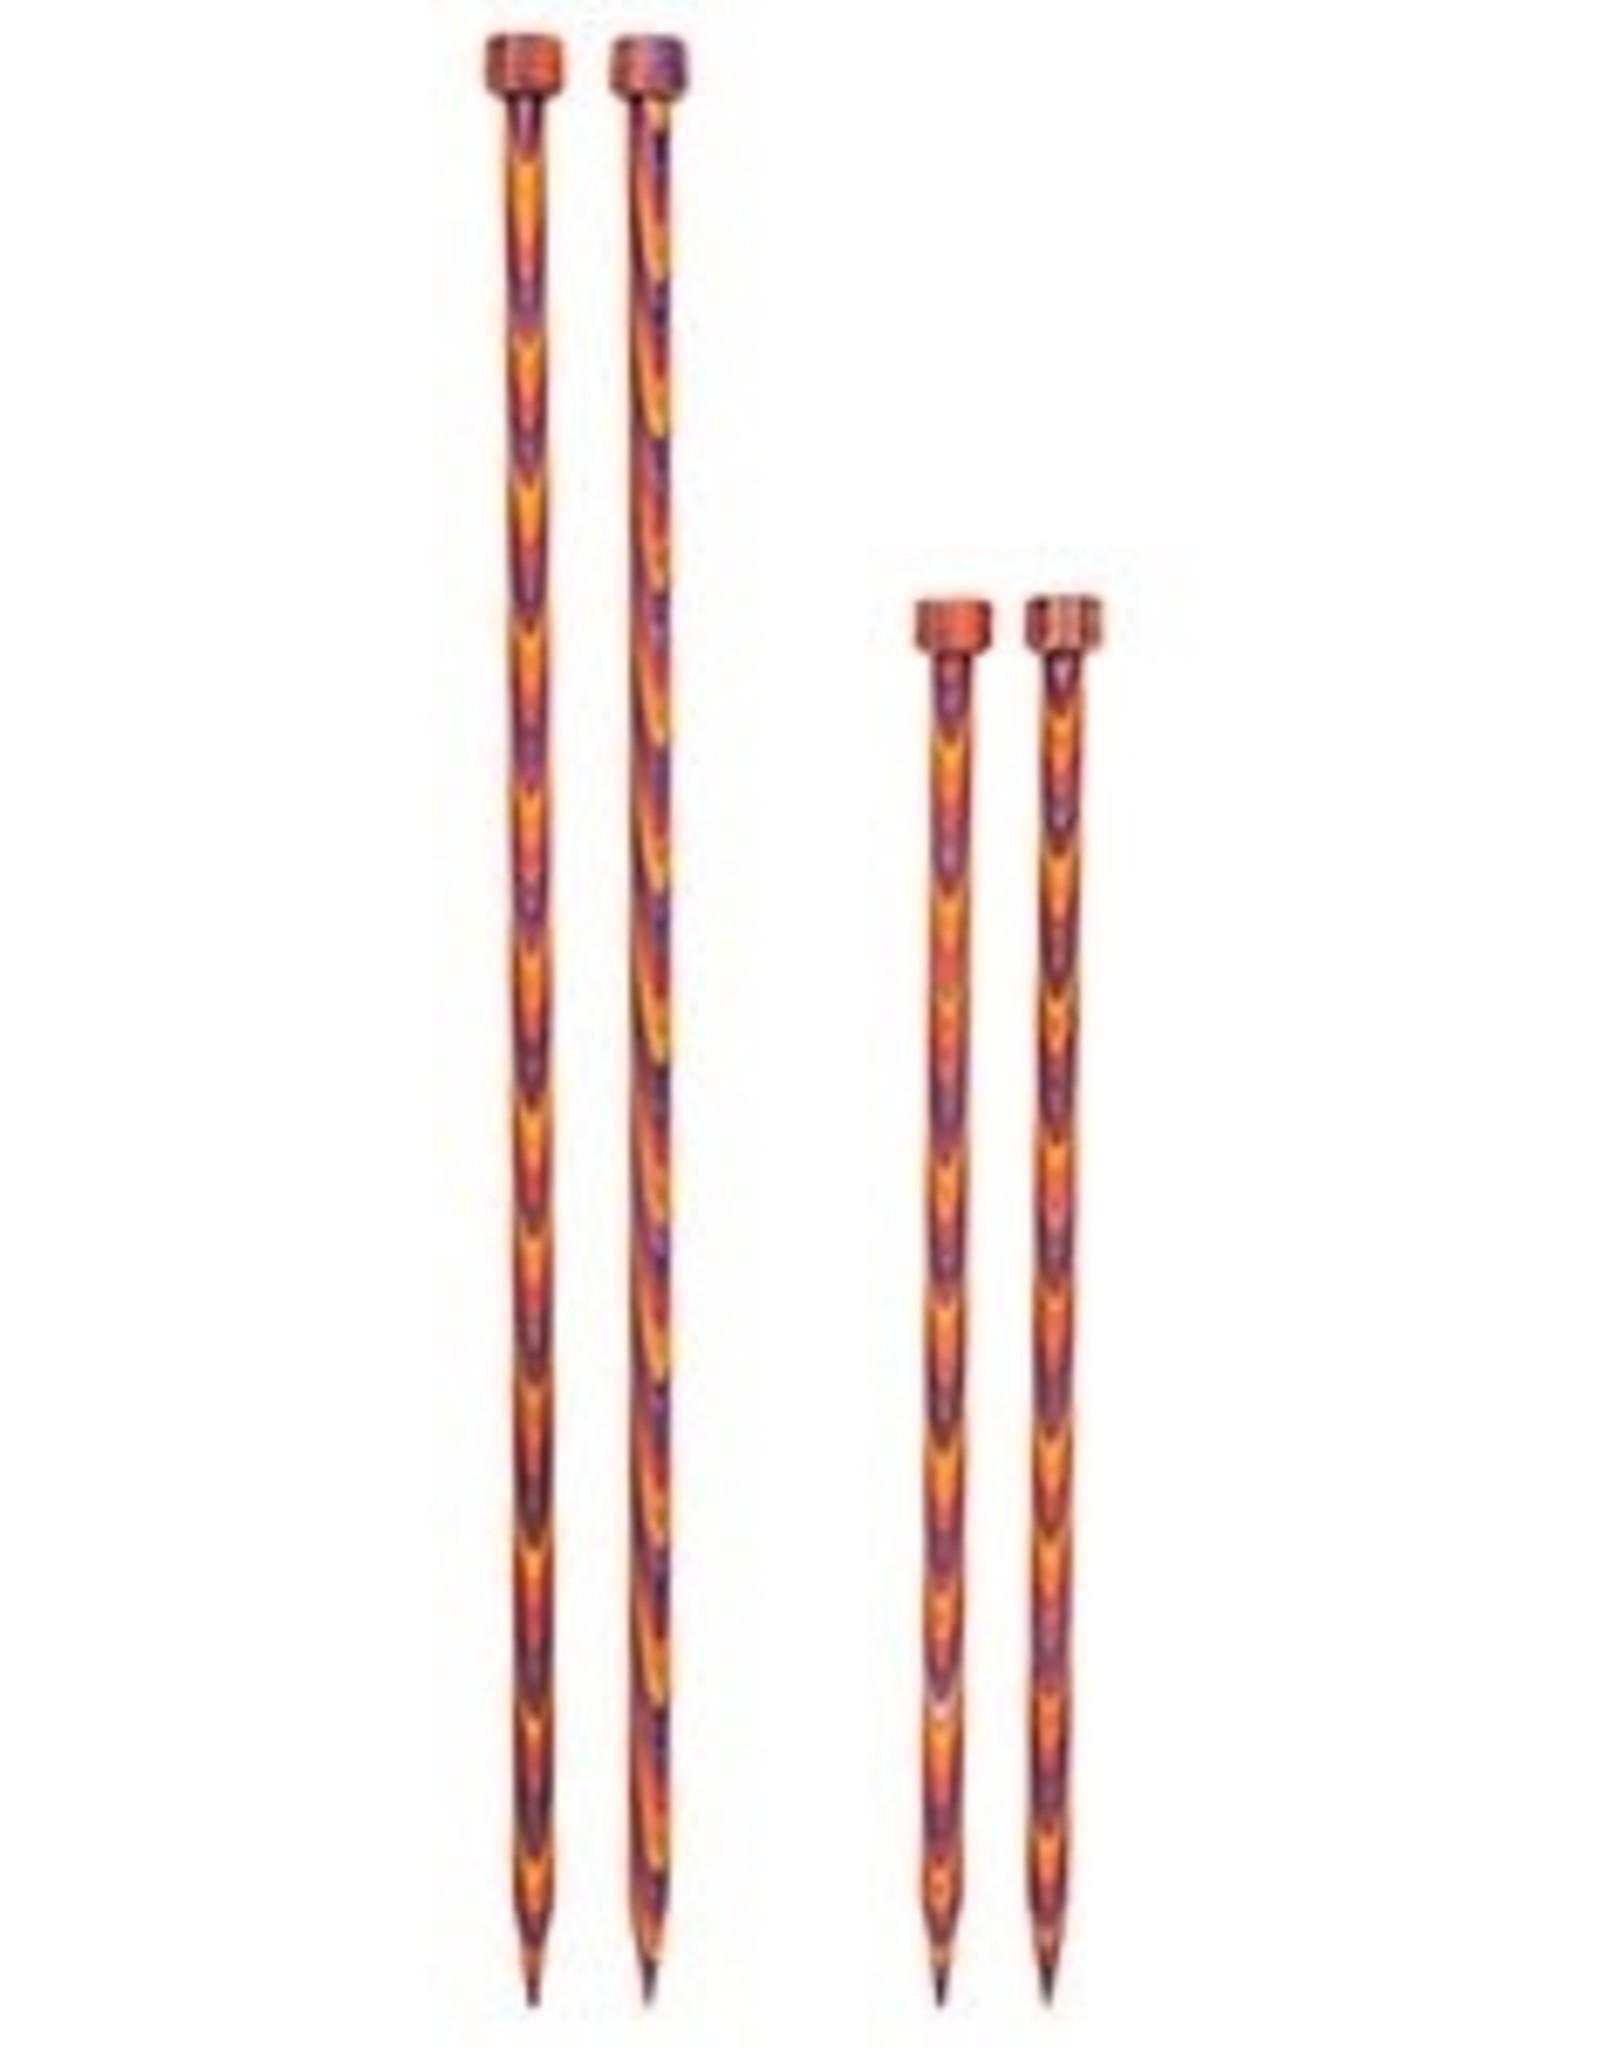 Needles - Straight